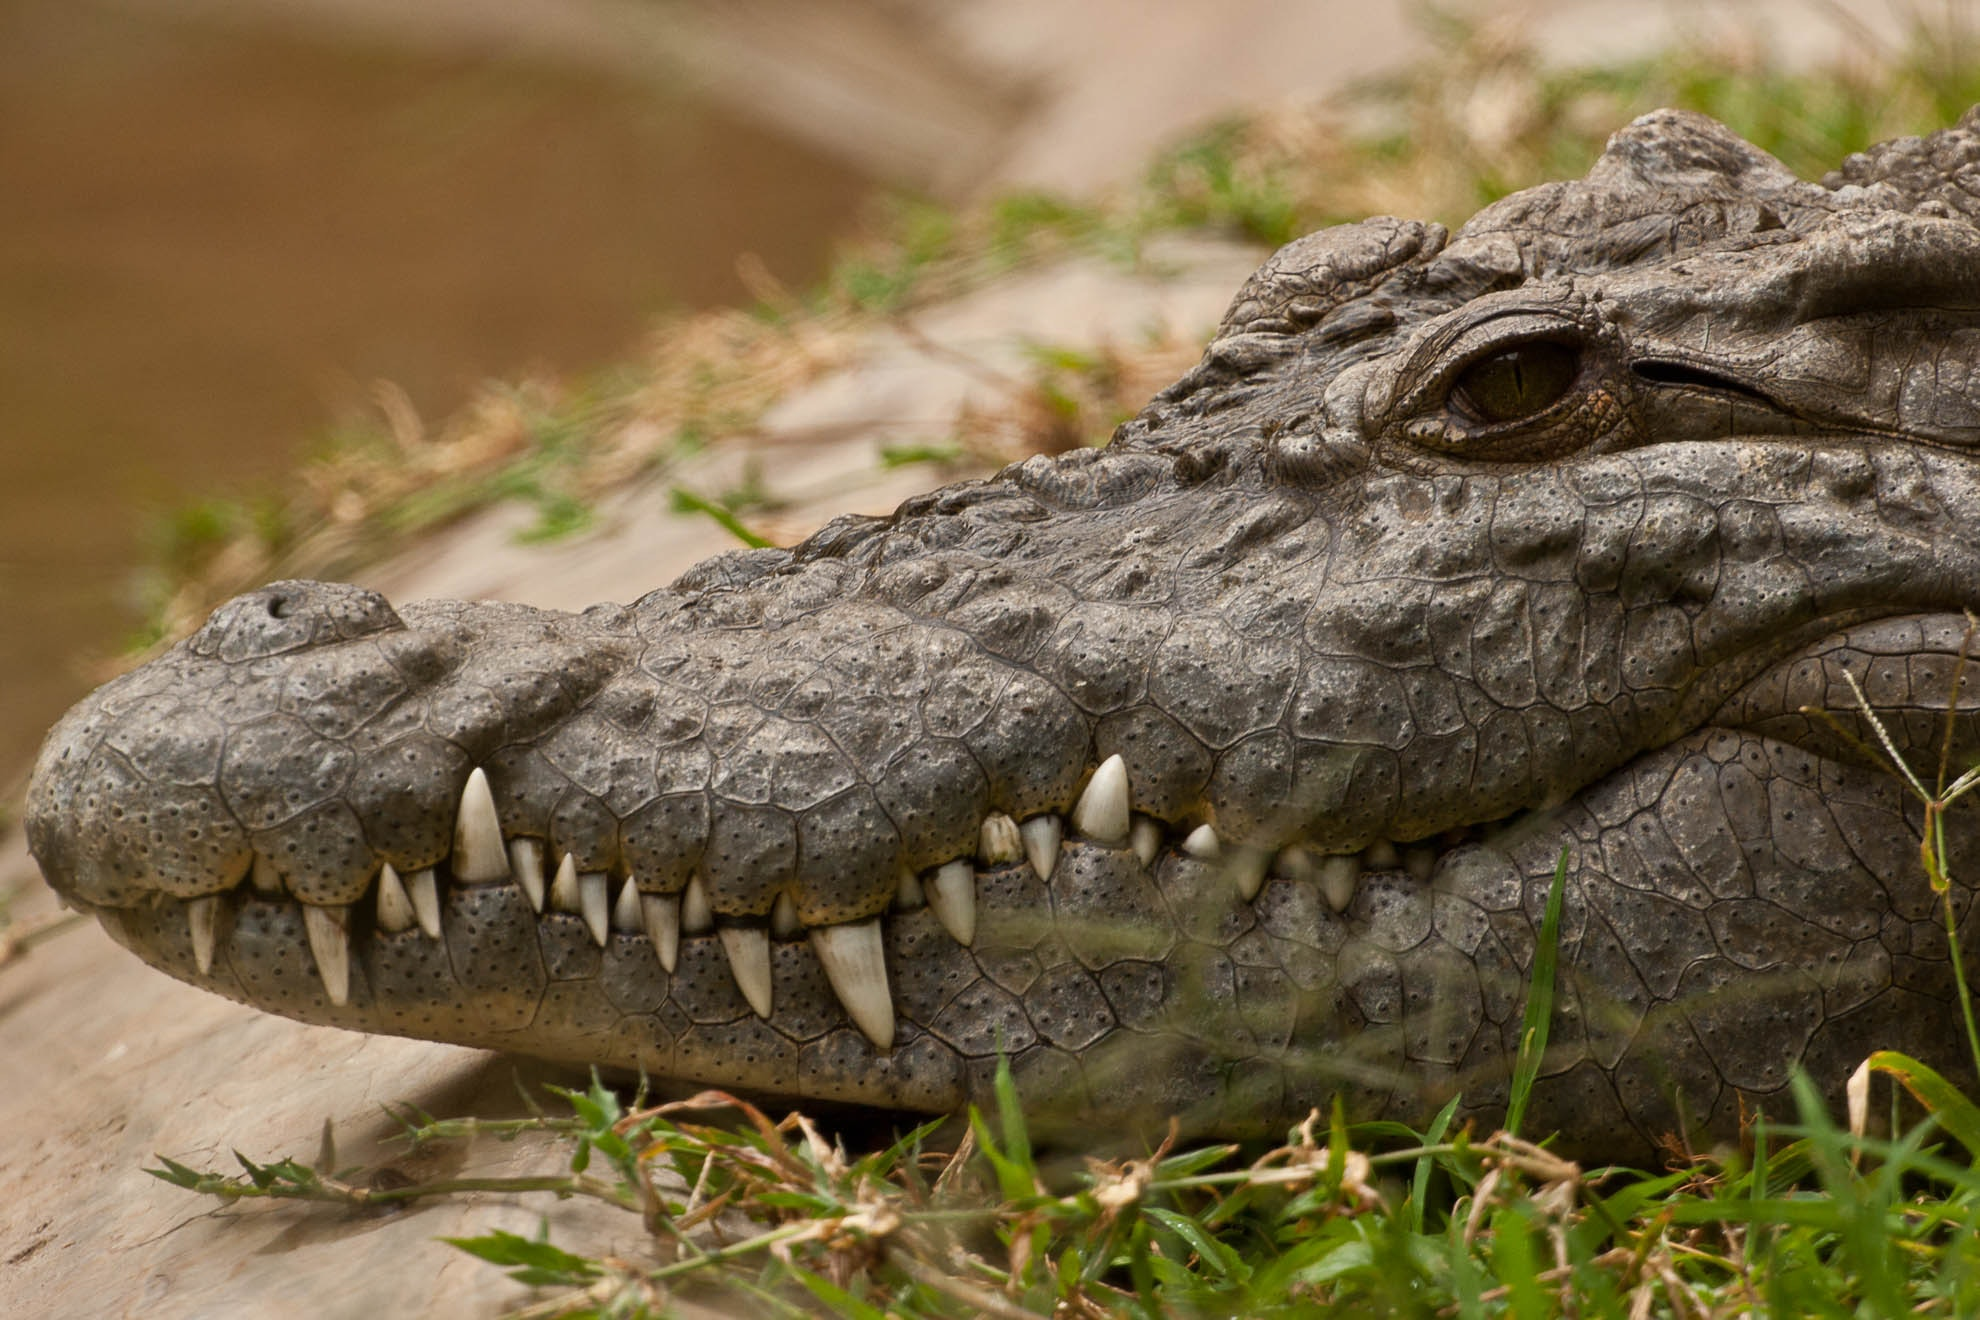 a 'tame' crocodile